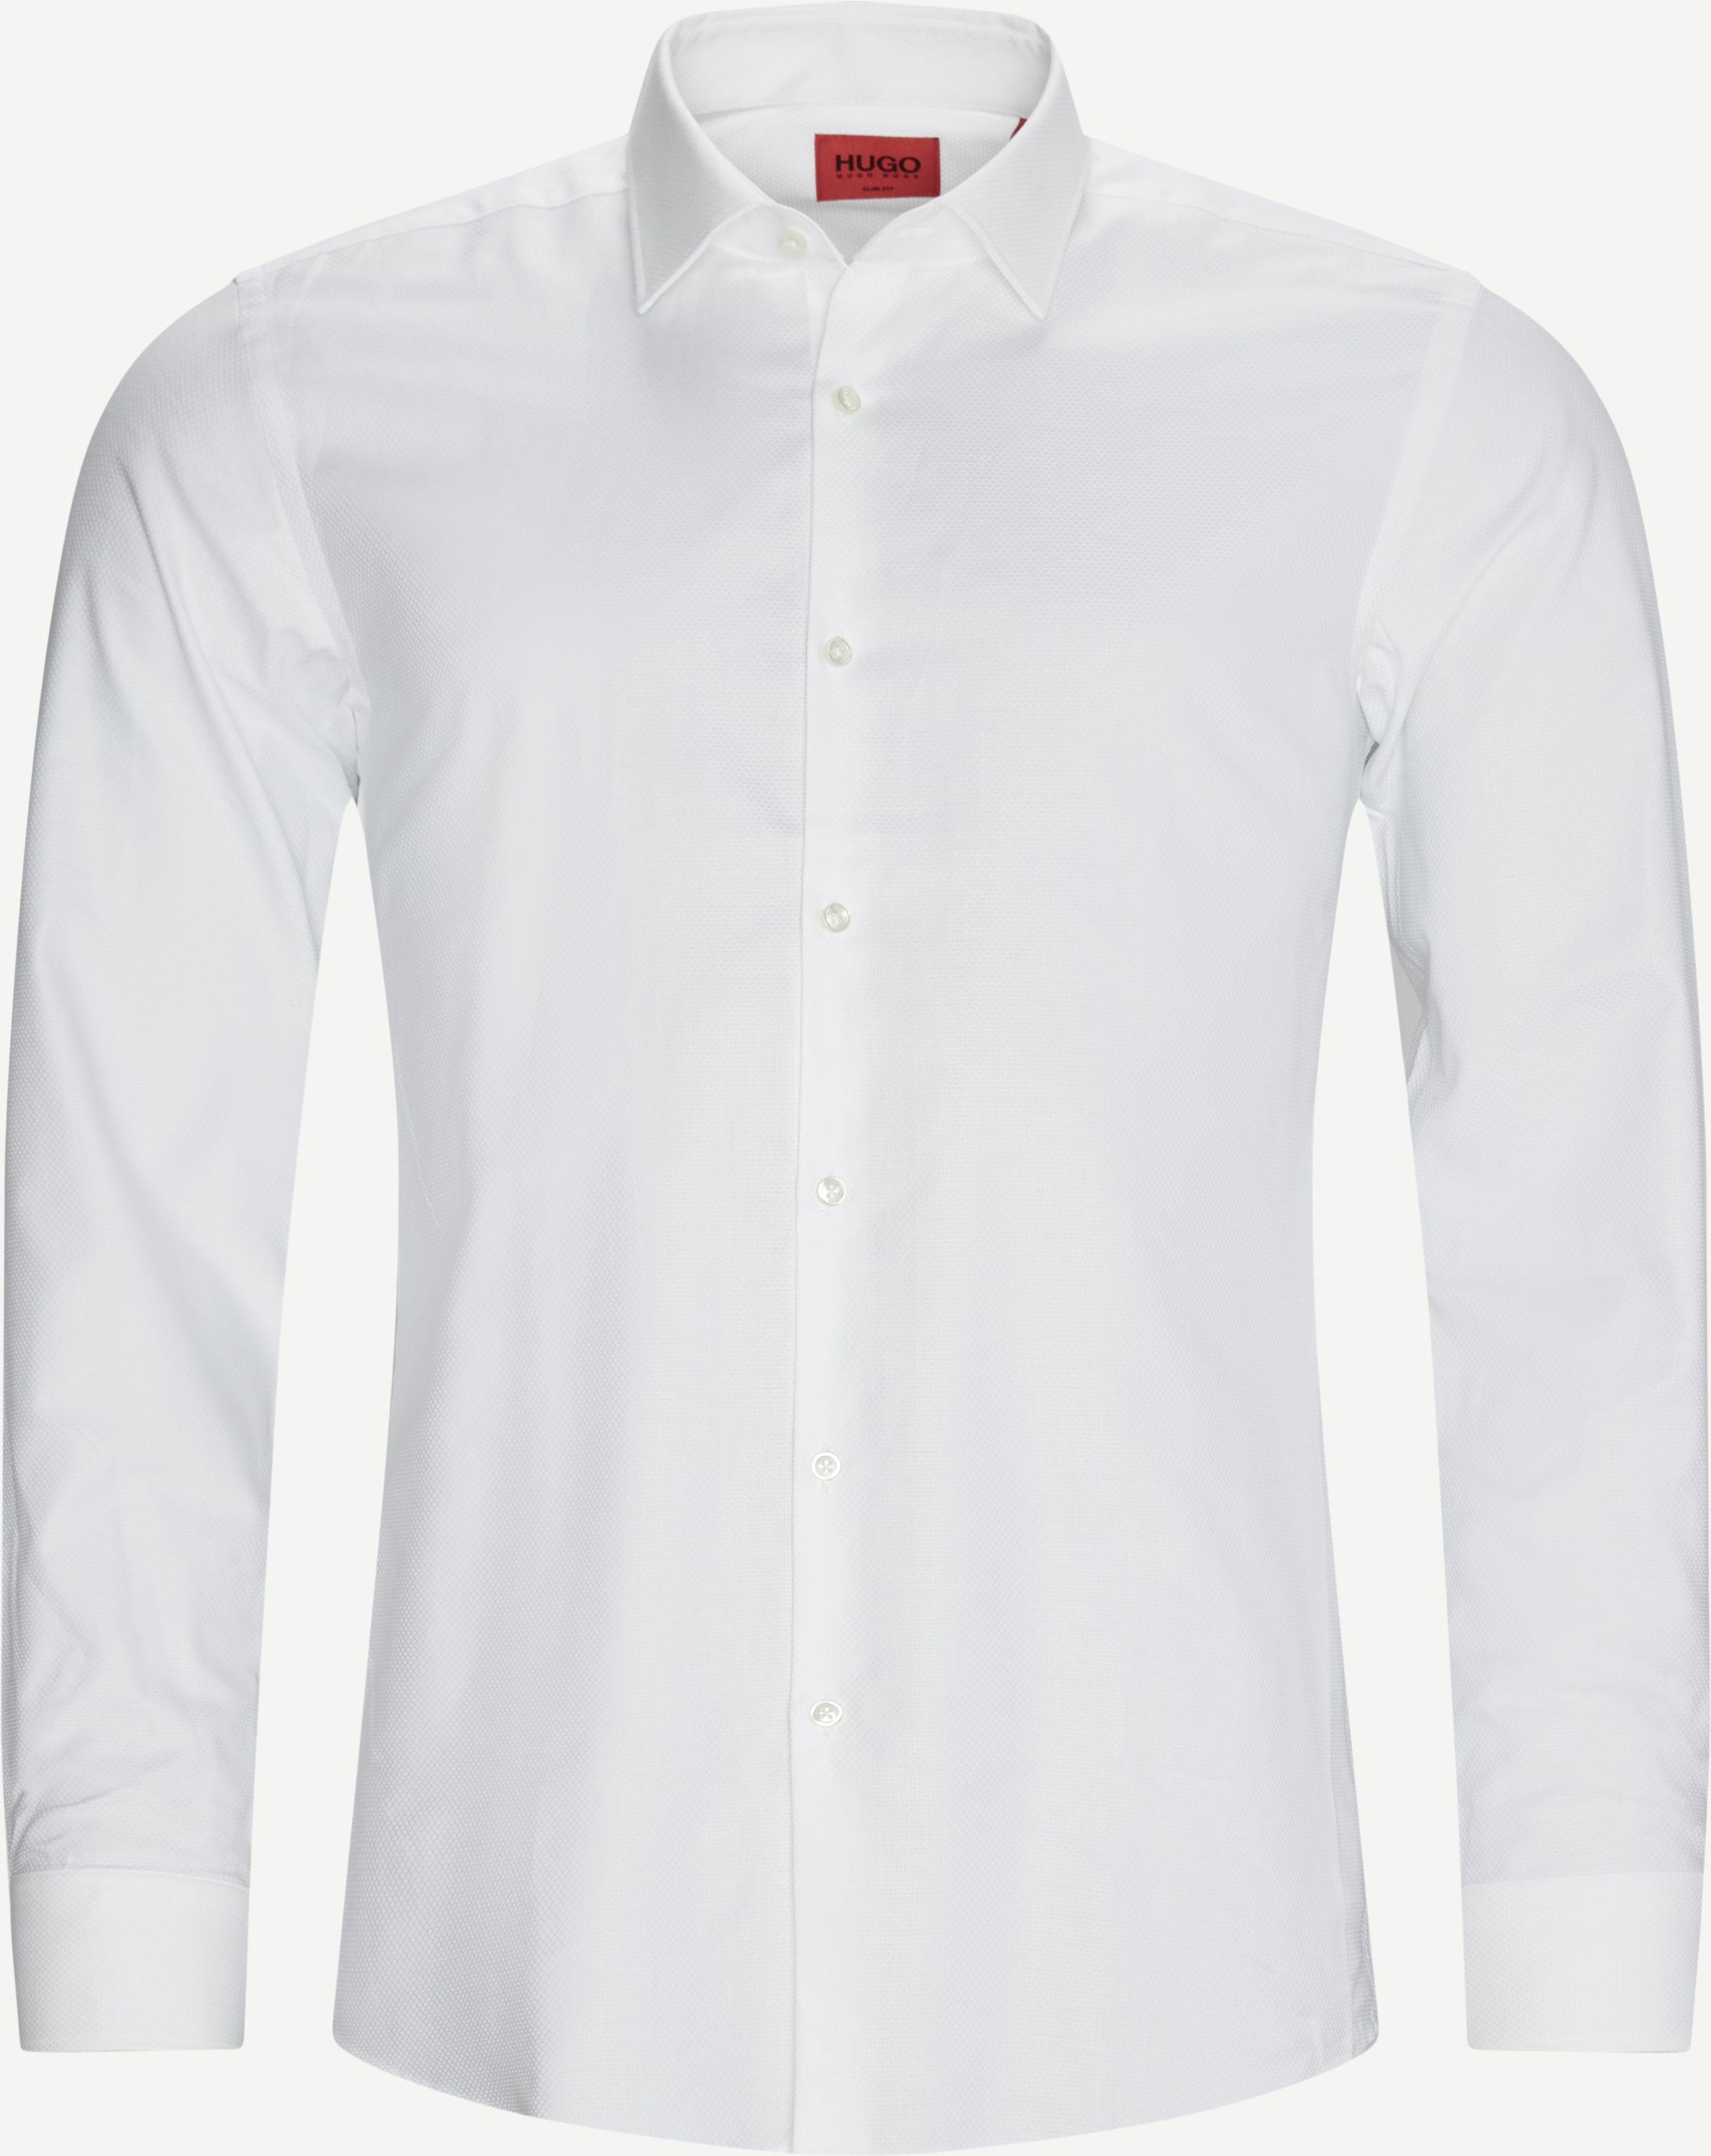 Kenno Shirt - Skjortor - Slim fit - Vit